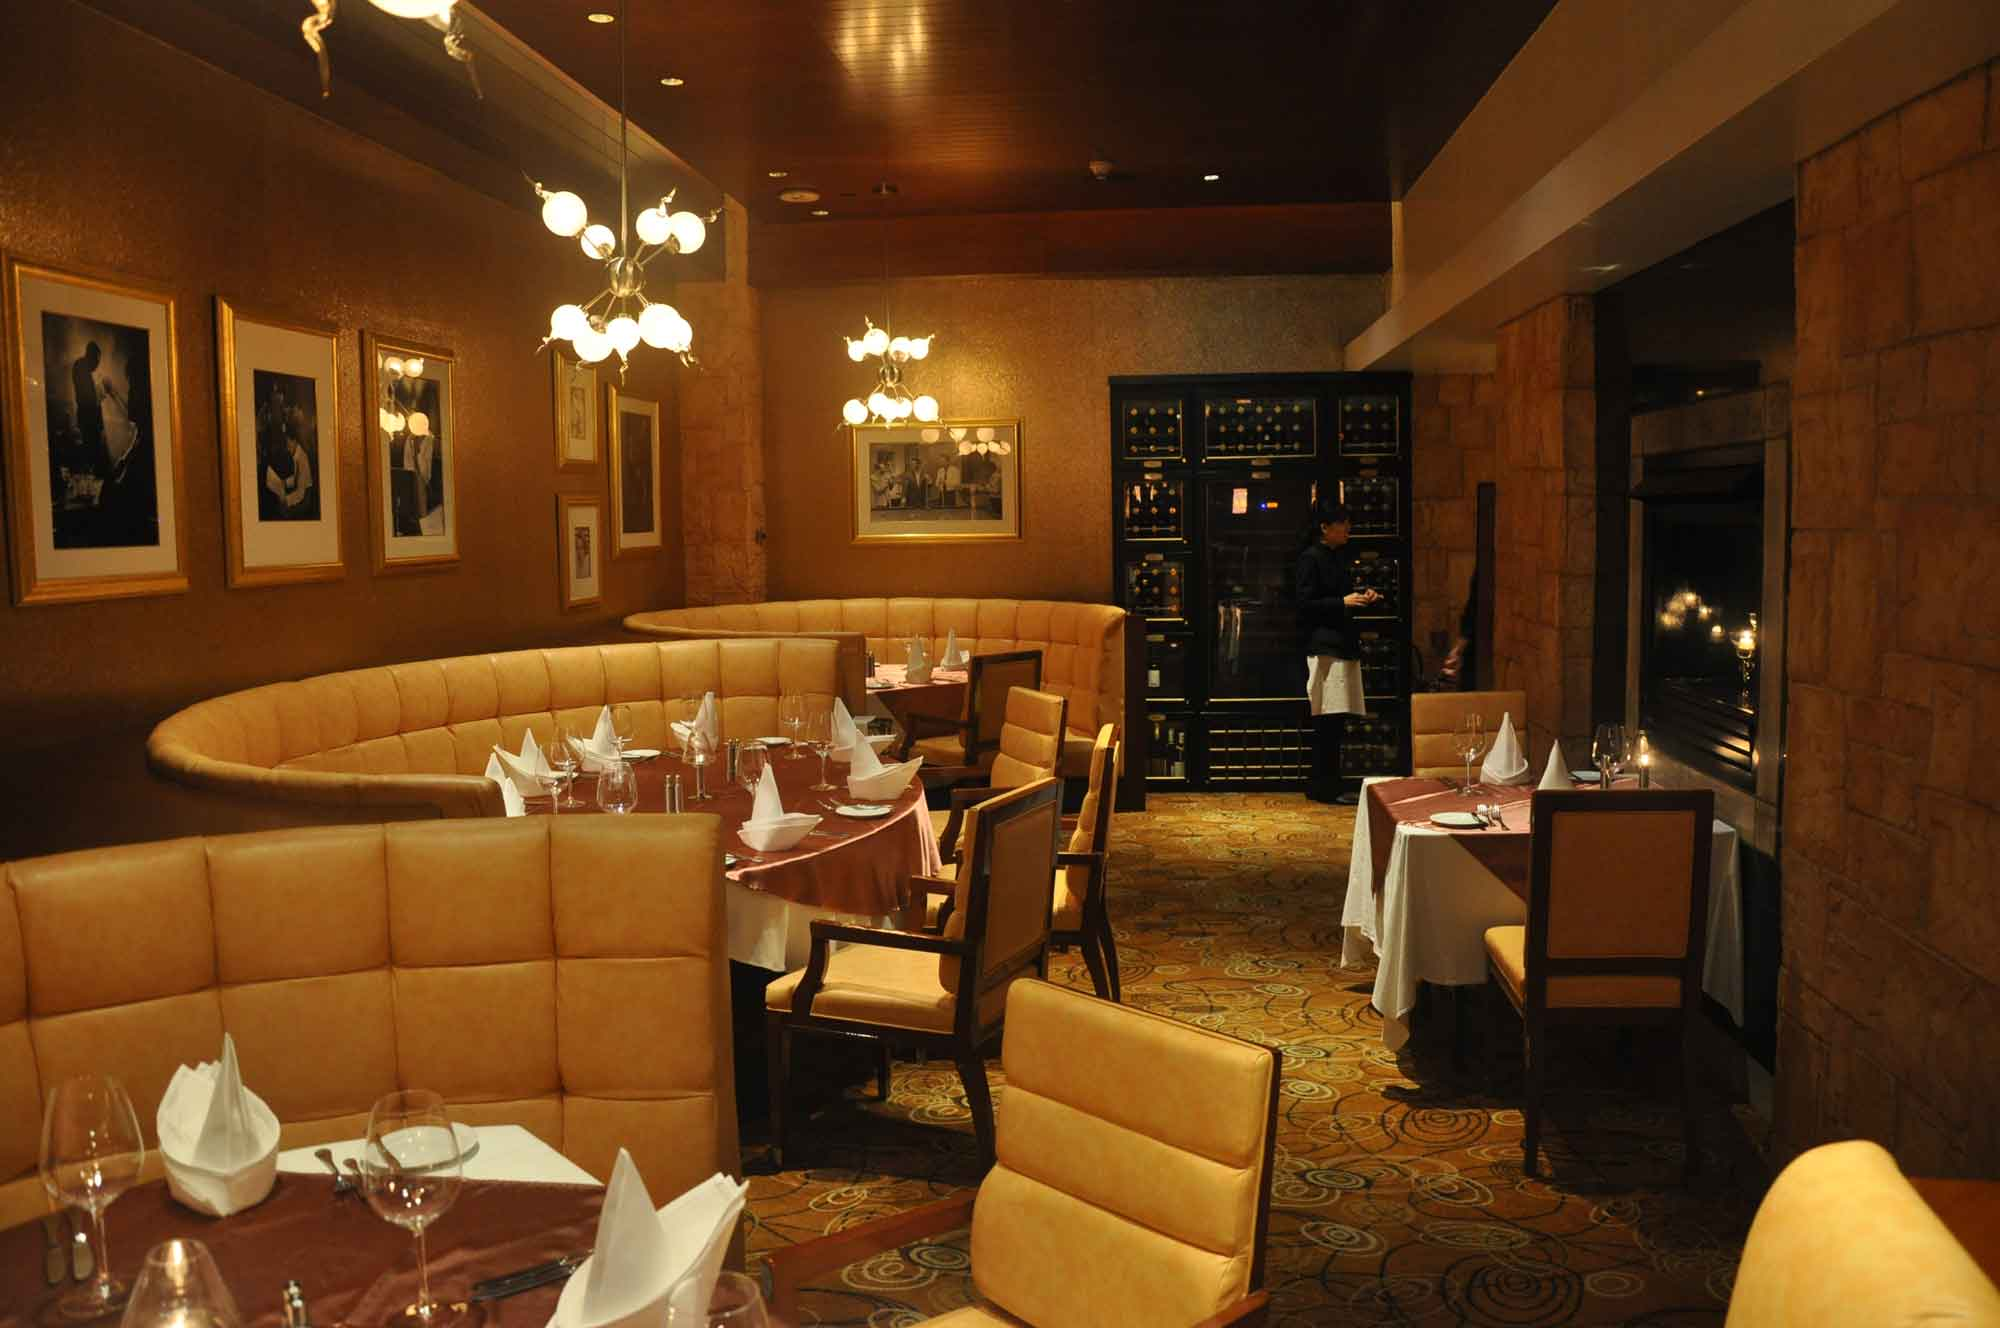 Copa Steakhouse interior